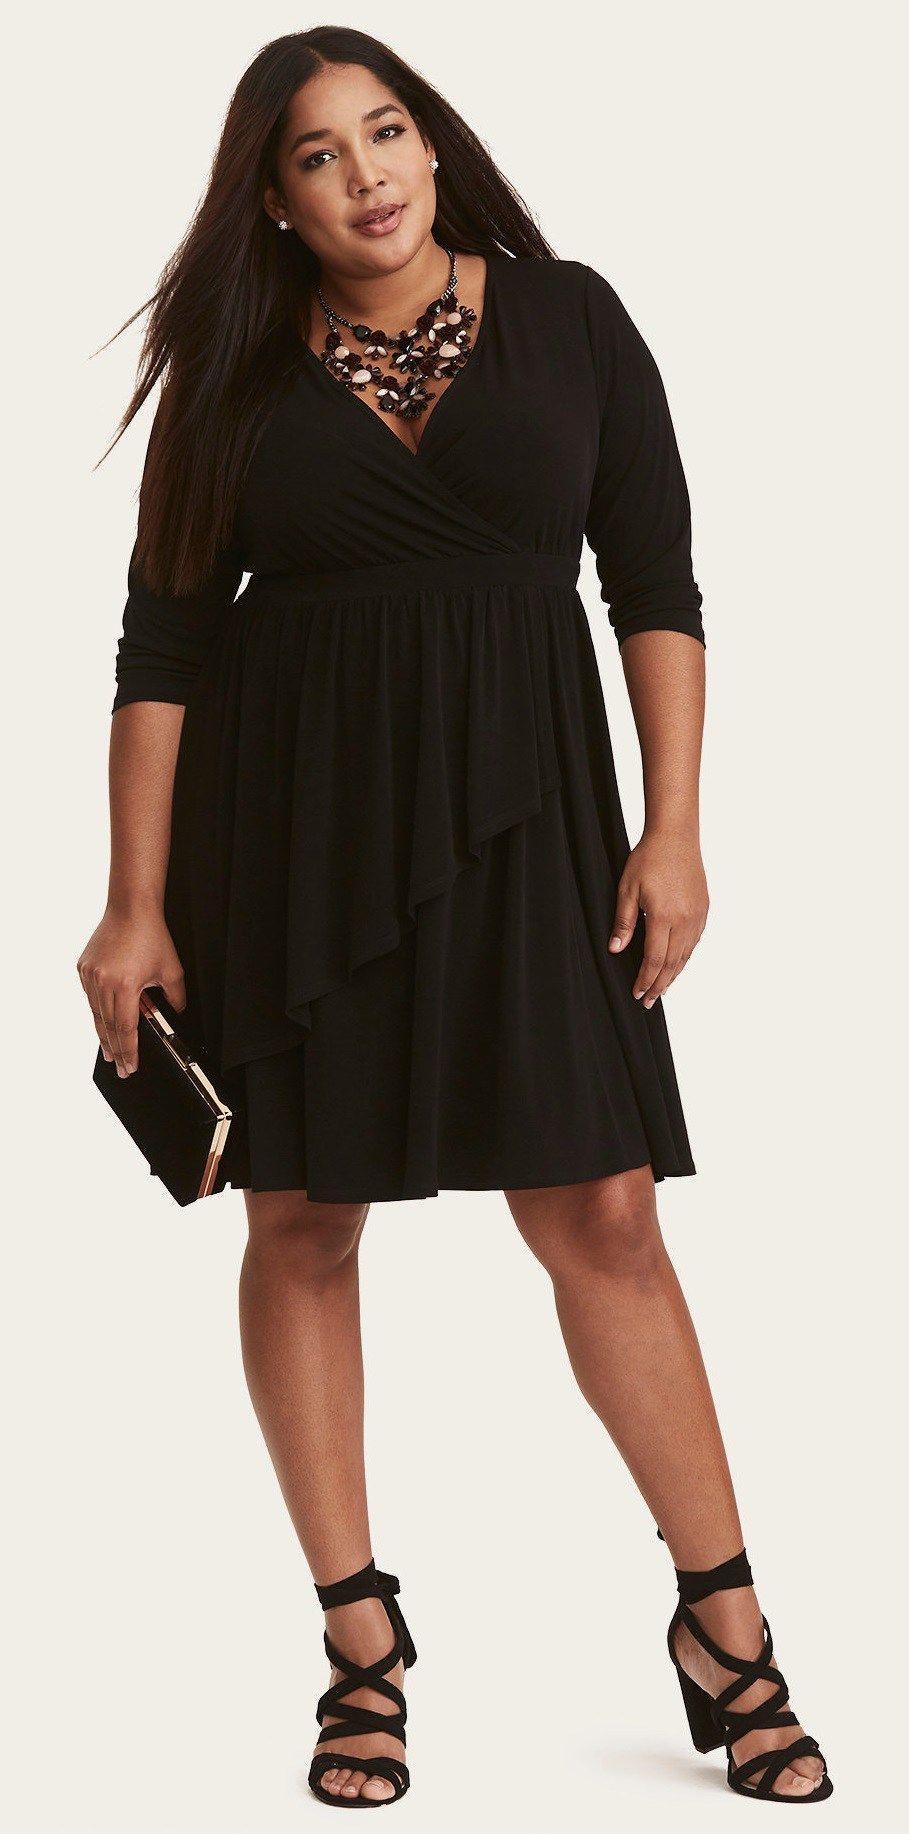 Black dresses for wedding guest   Plus Size Spring Wedding Guest Dresses with Sleeves  Pinterest